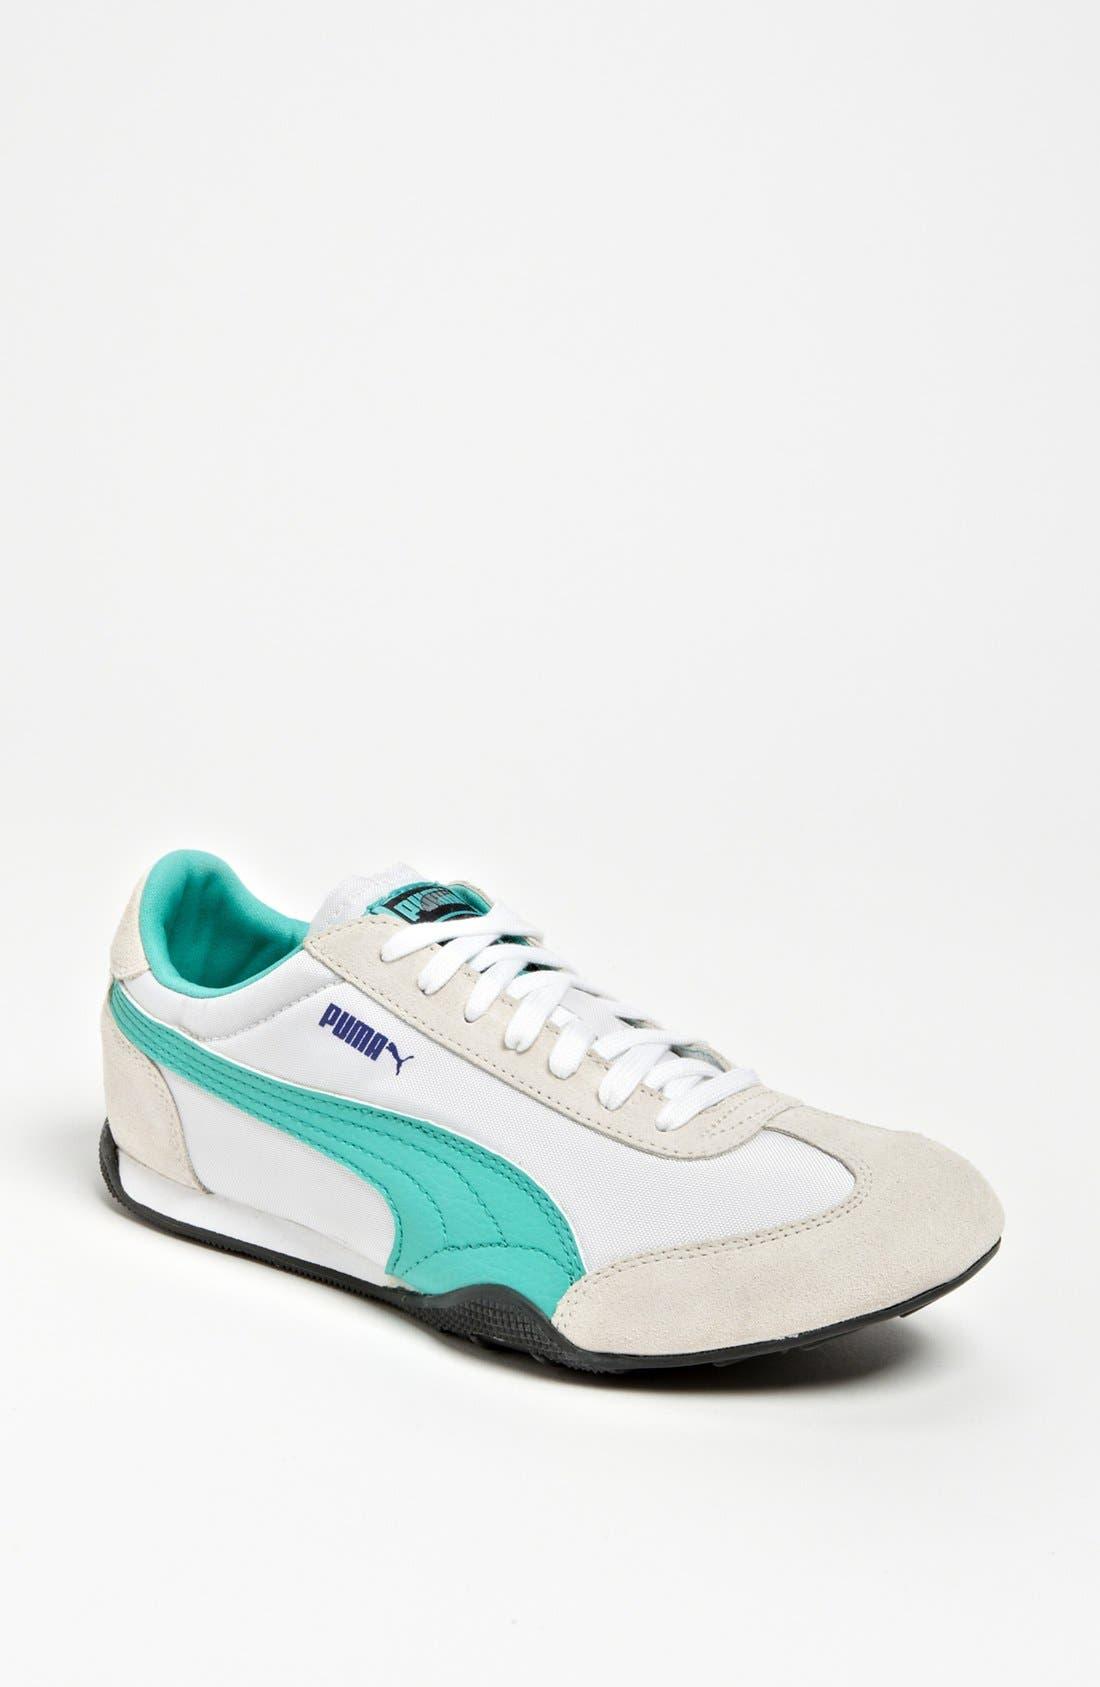 Alternate Image 1 Selected - PUMA 'Mirage 76' Sneaker